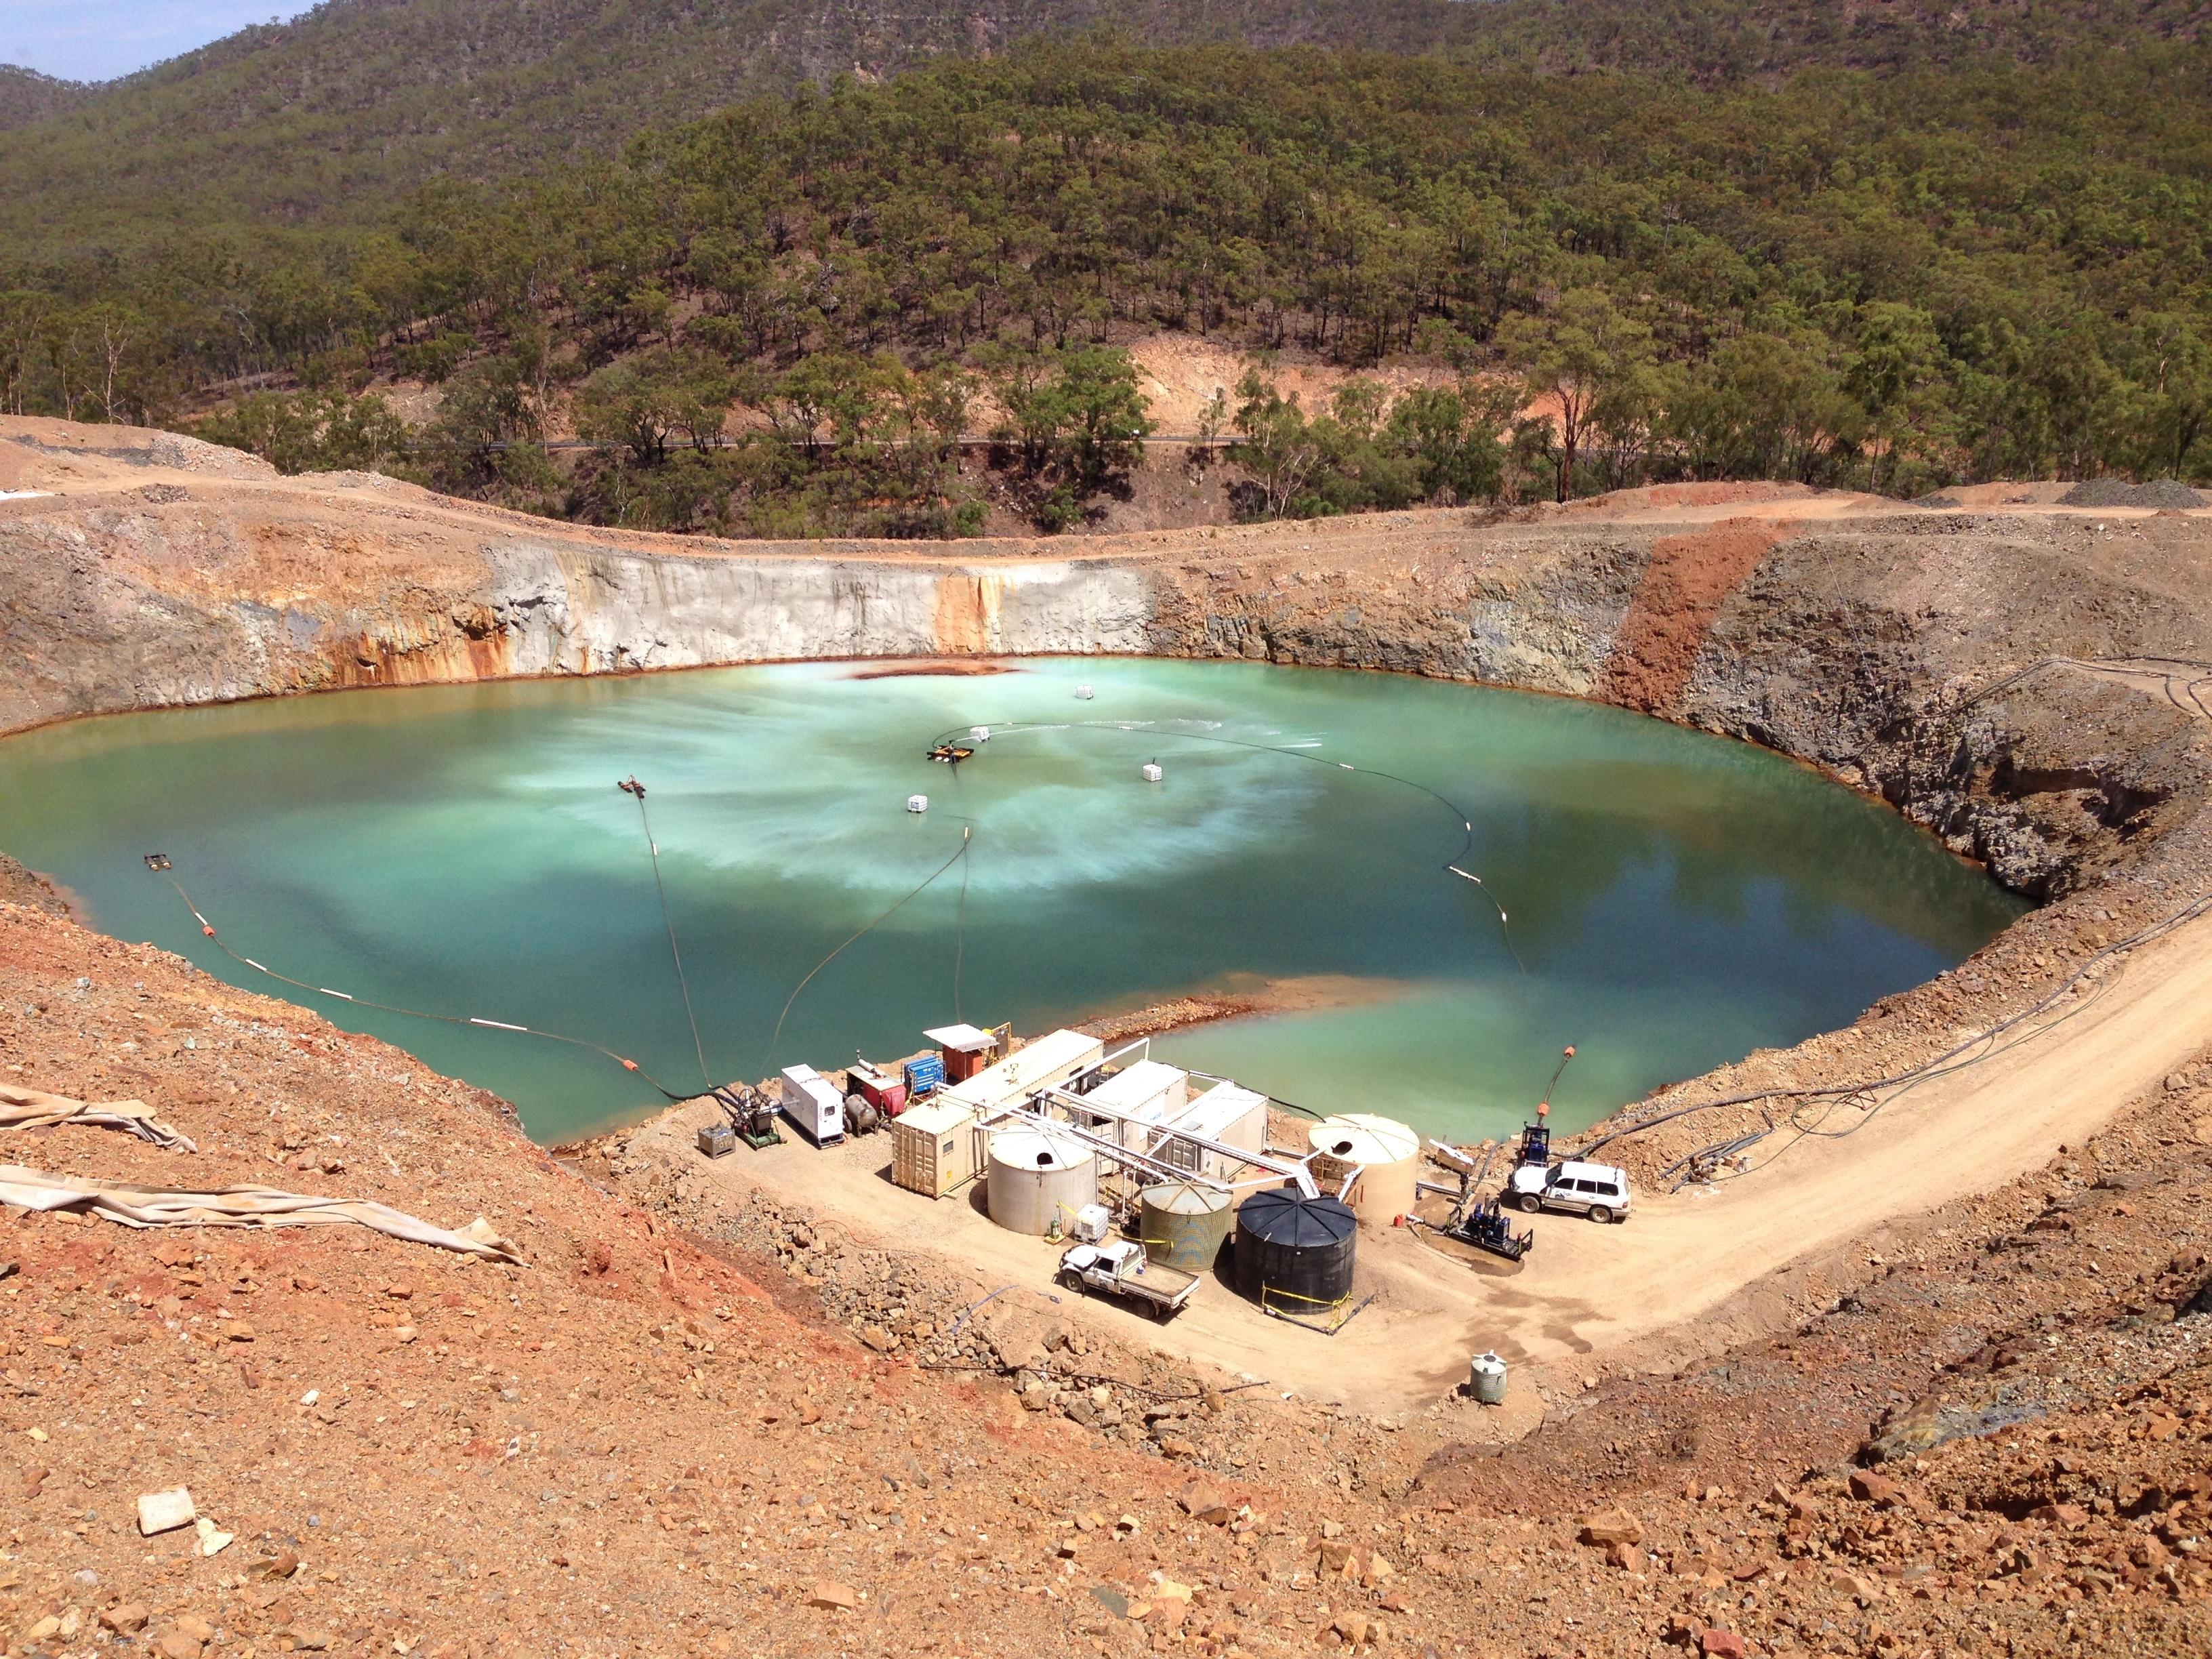 CSIRO_ScienceImage_2181_View_of_a_mine_wastewater_pit.jpg